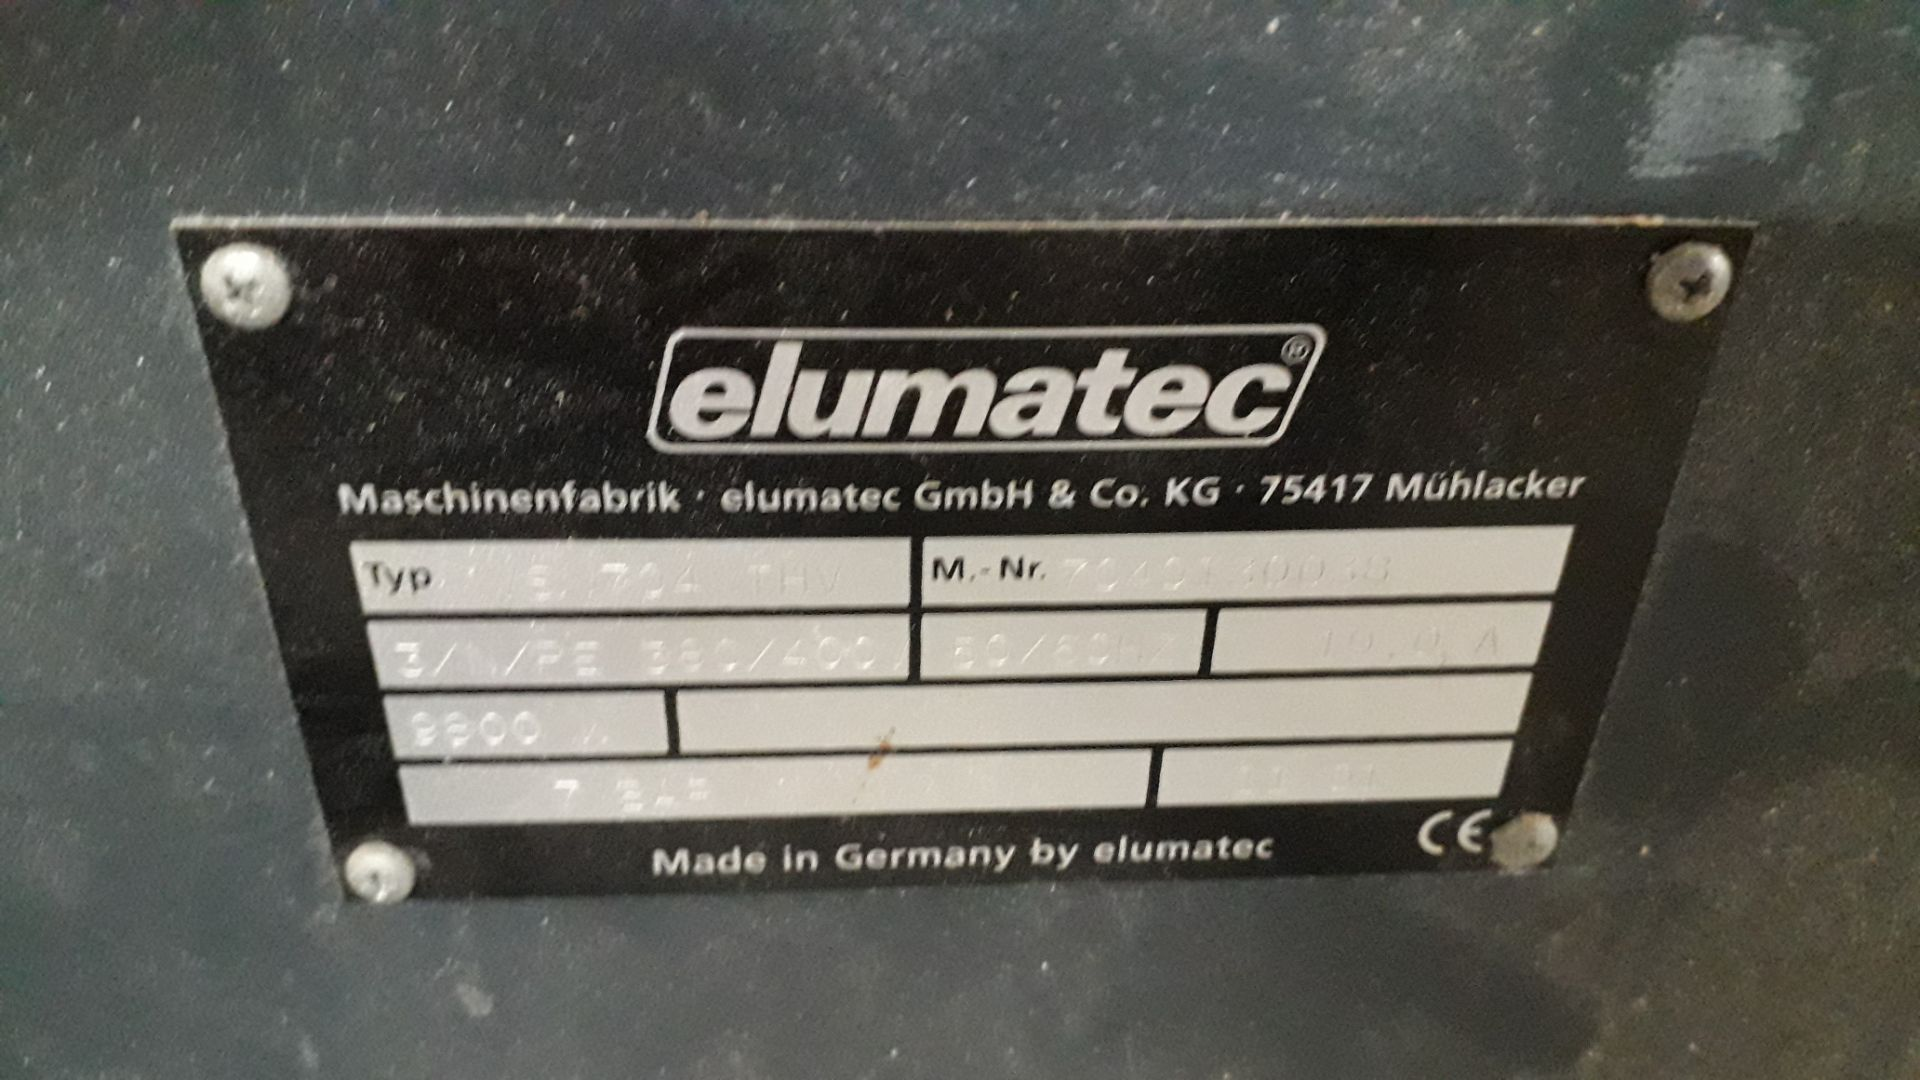 Lot 7 - Elumatec VS704THV 4 Headed Welder Serial Number 7040130058 (11/01) (Hard Wired – Disconnection